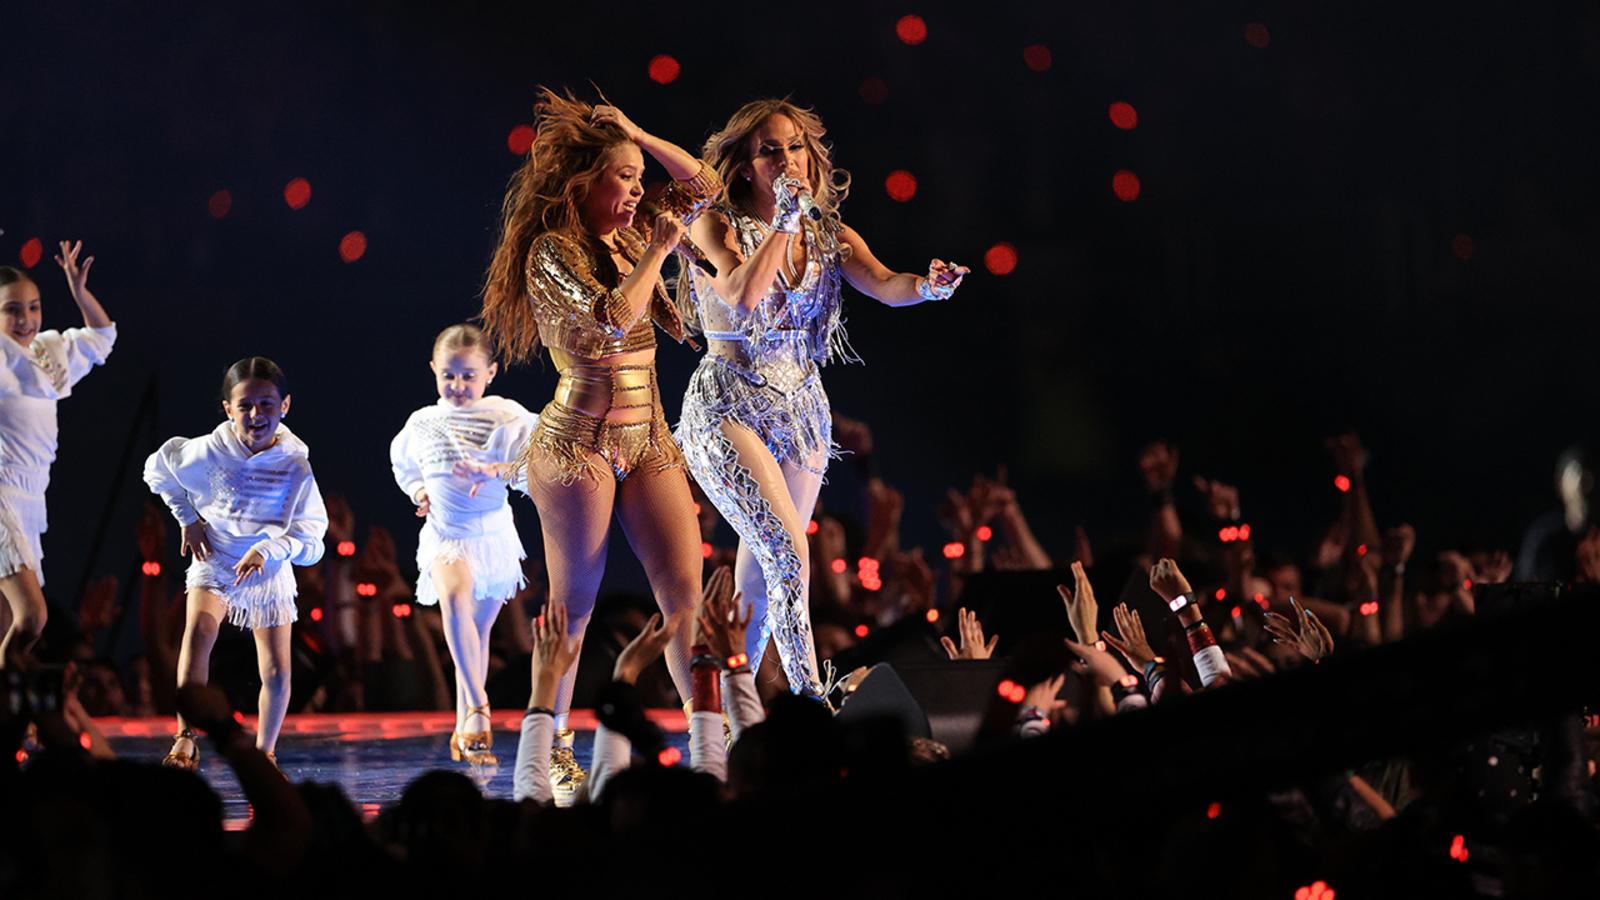 Jennifer Lopez Shakira Take Stage At Super Bowl 2020 Halftime Show Abc7 San Francisco